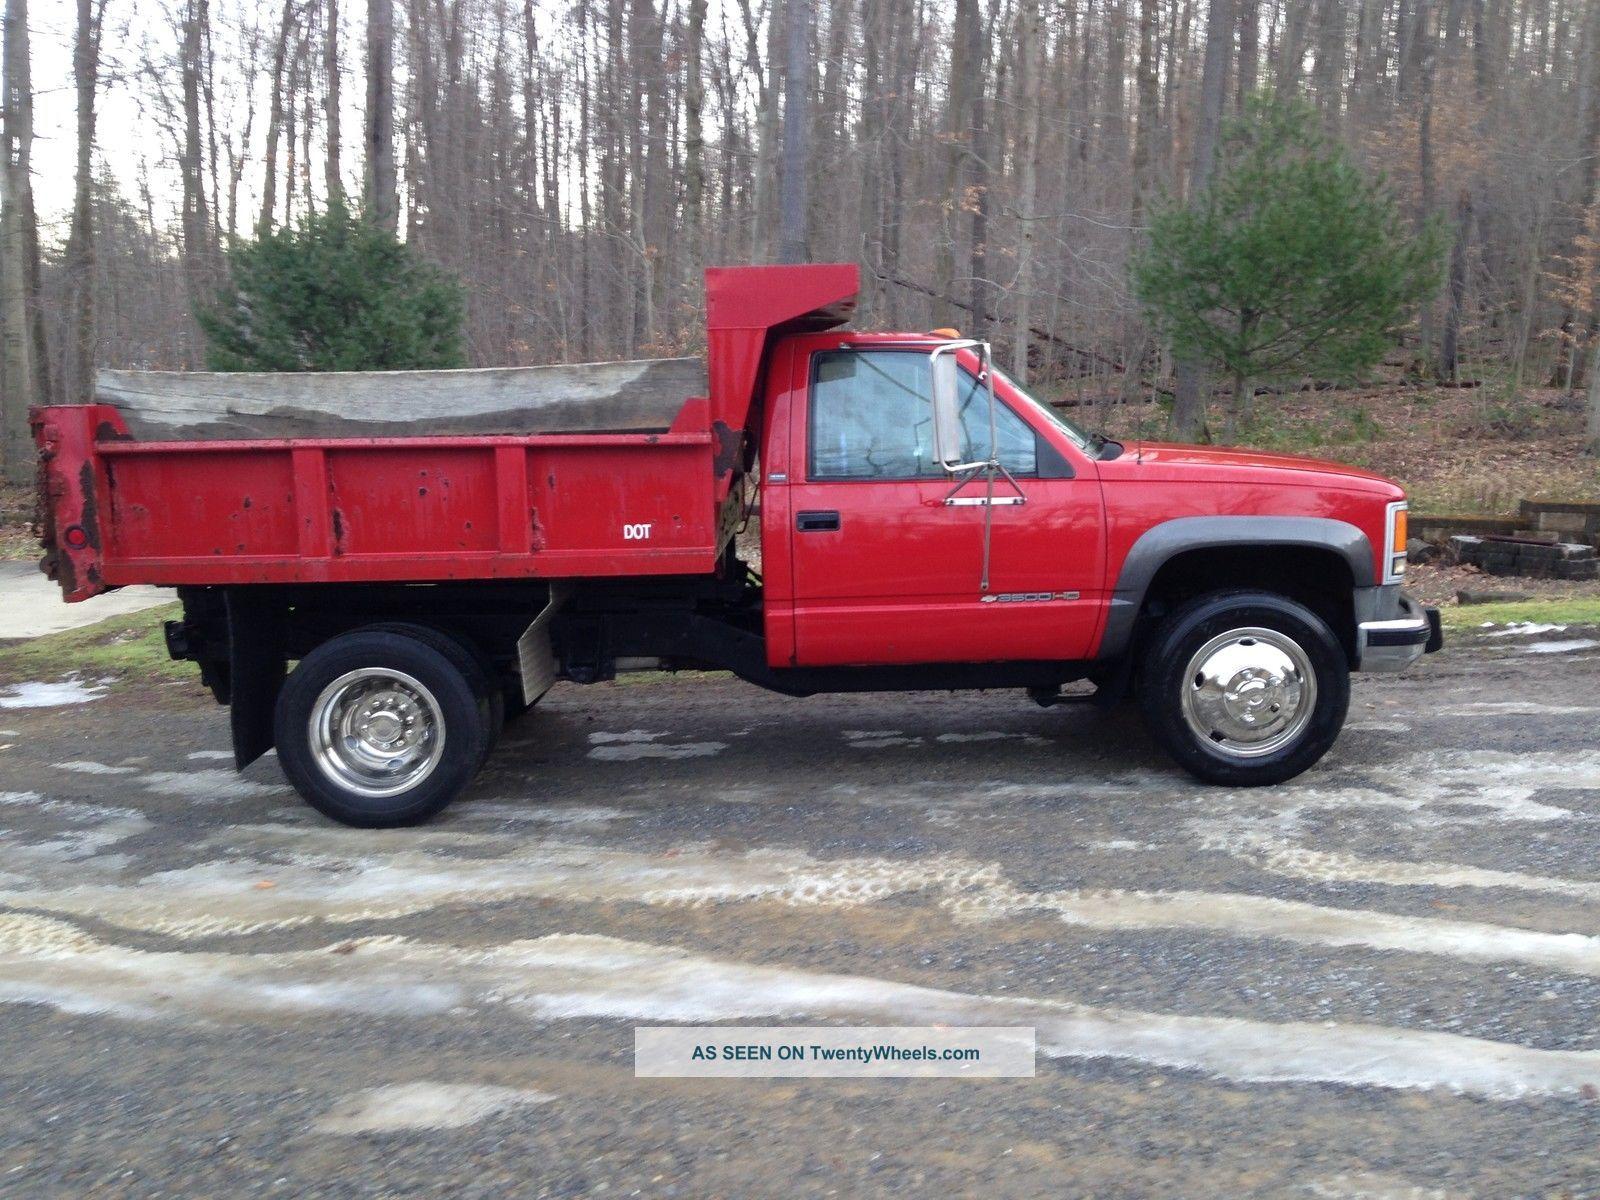 1992 Chevrolet 3500 Hd Dump Trucks photo